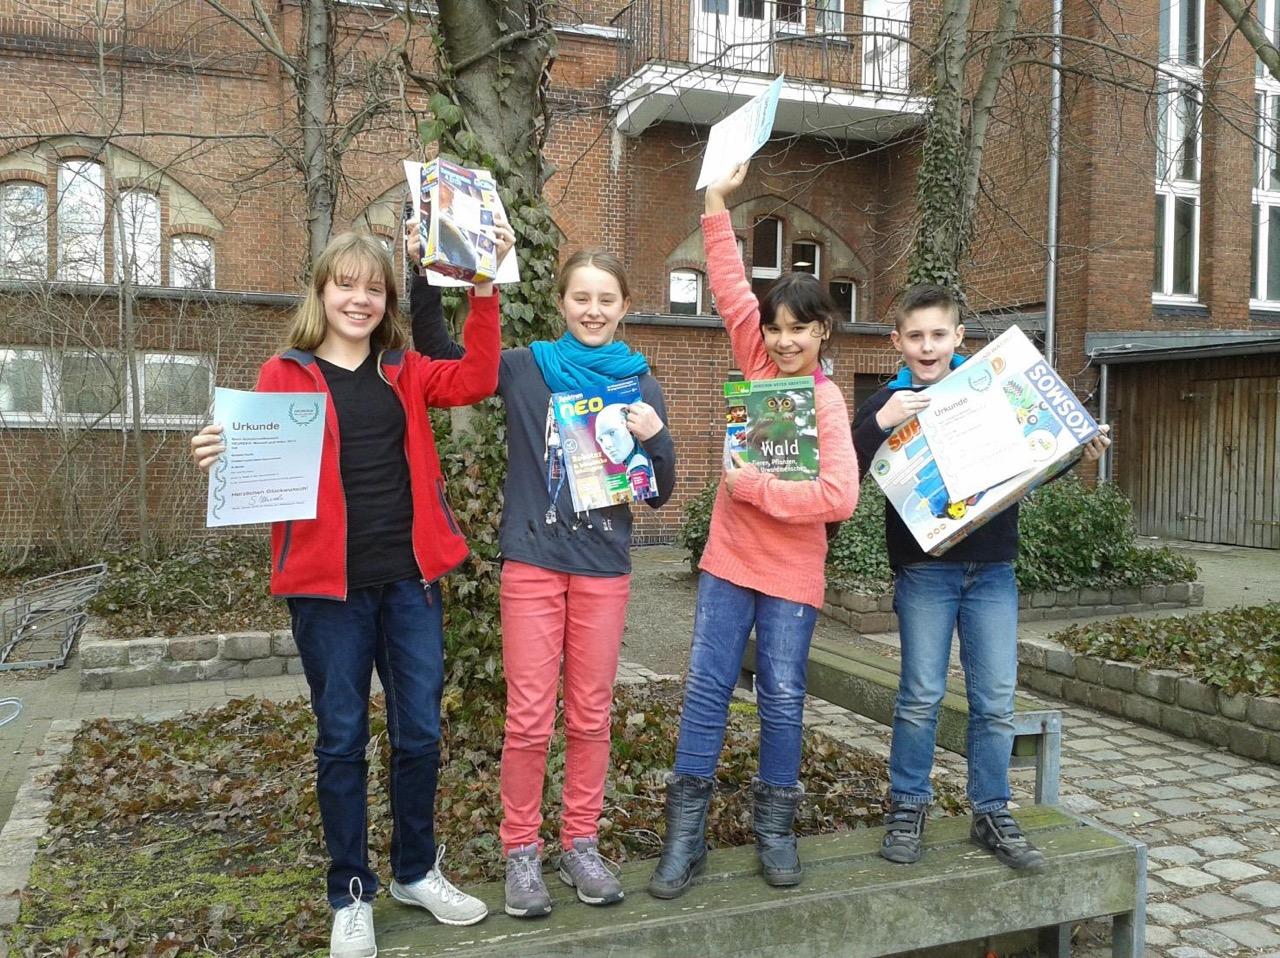 http://www.steingymnasium.de/wp-content/uploads/2015/03/Heurekasieger.jpeg